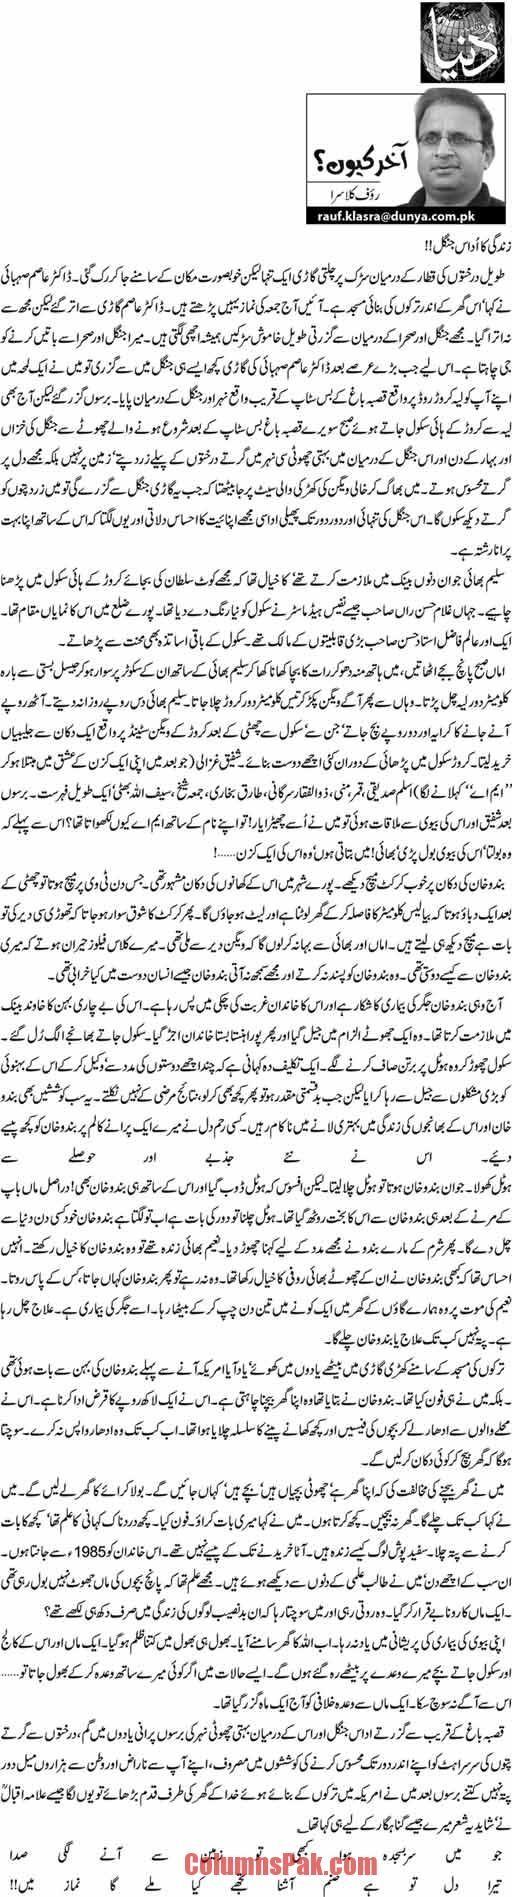 haroon ur rasheed columnist biography examples